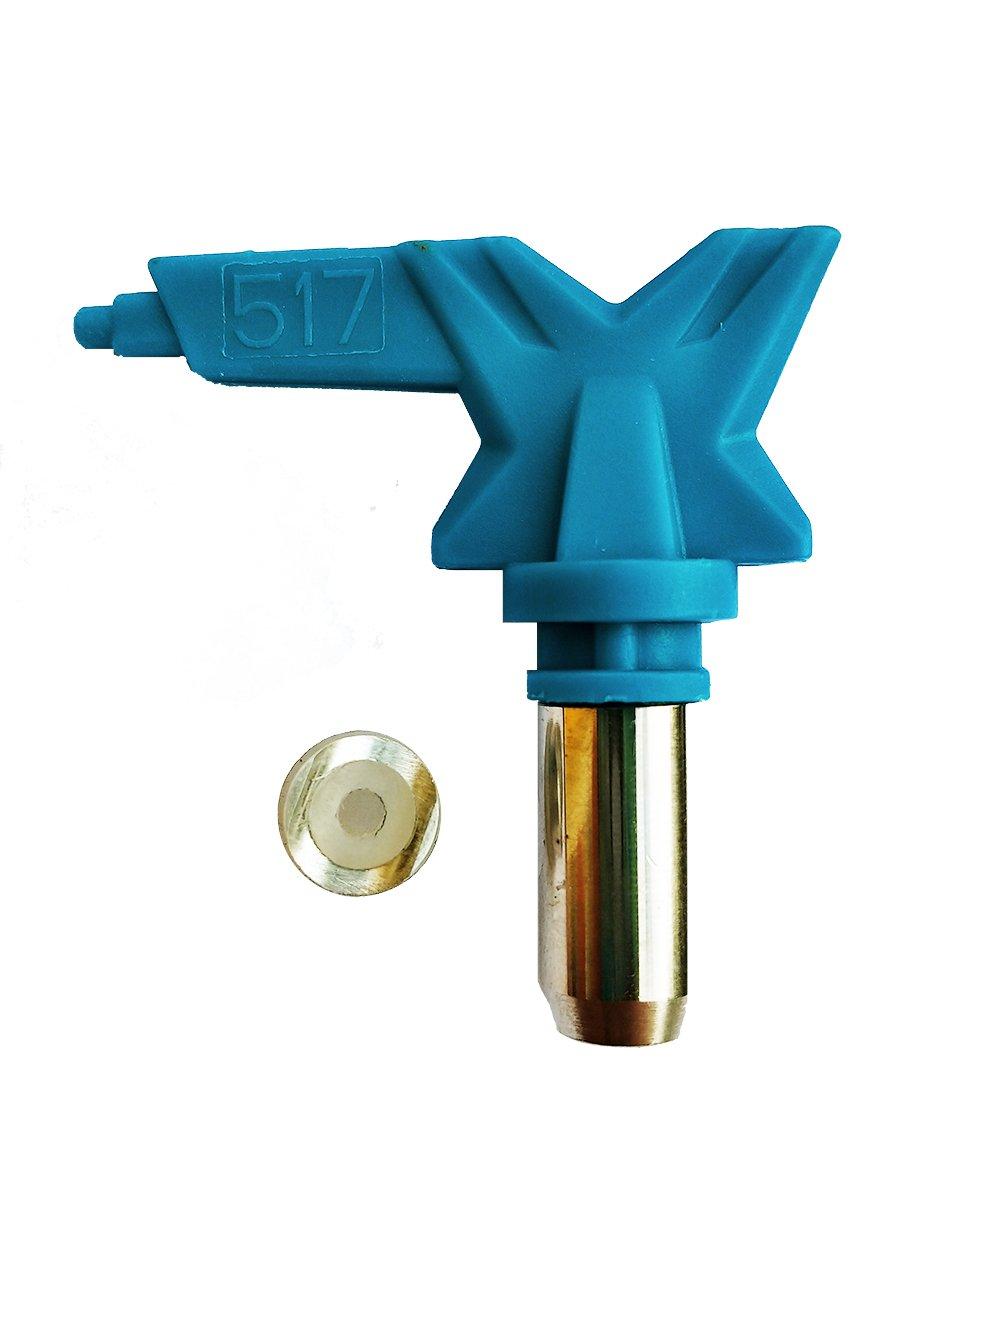 Dino Power DPX Airless Spray Tip - 311, 315, 415, 417, 519, 619 (417)